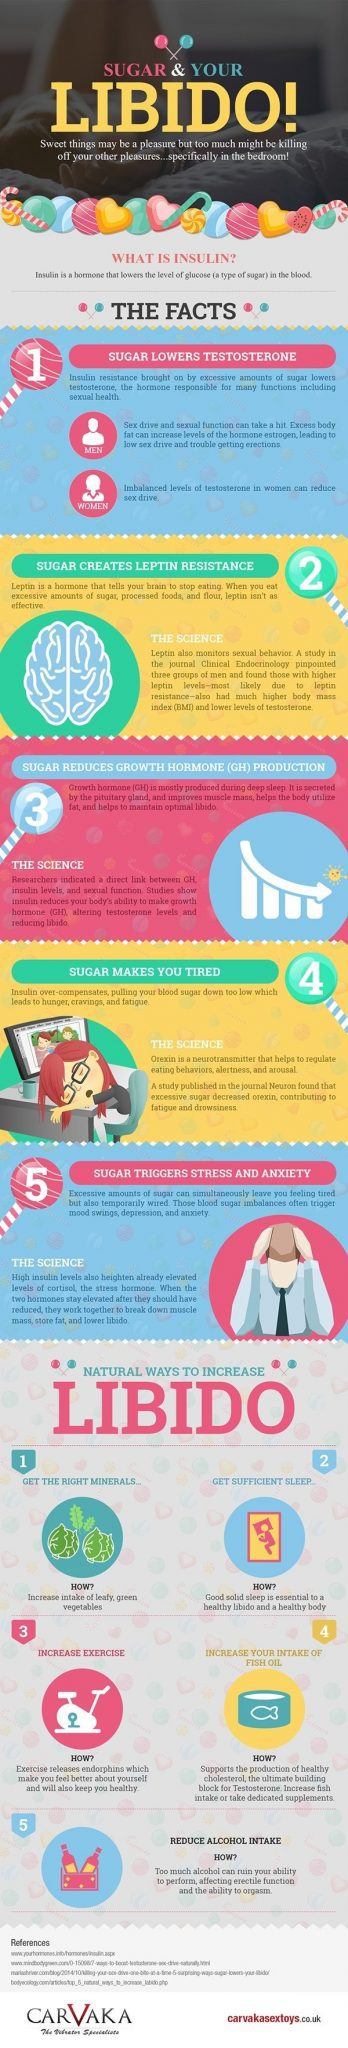 Sugar-and-Libido-infographic